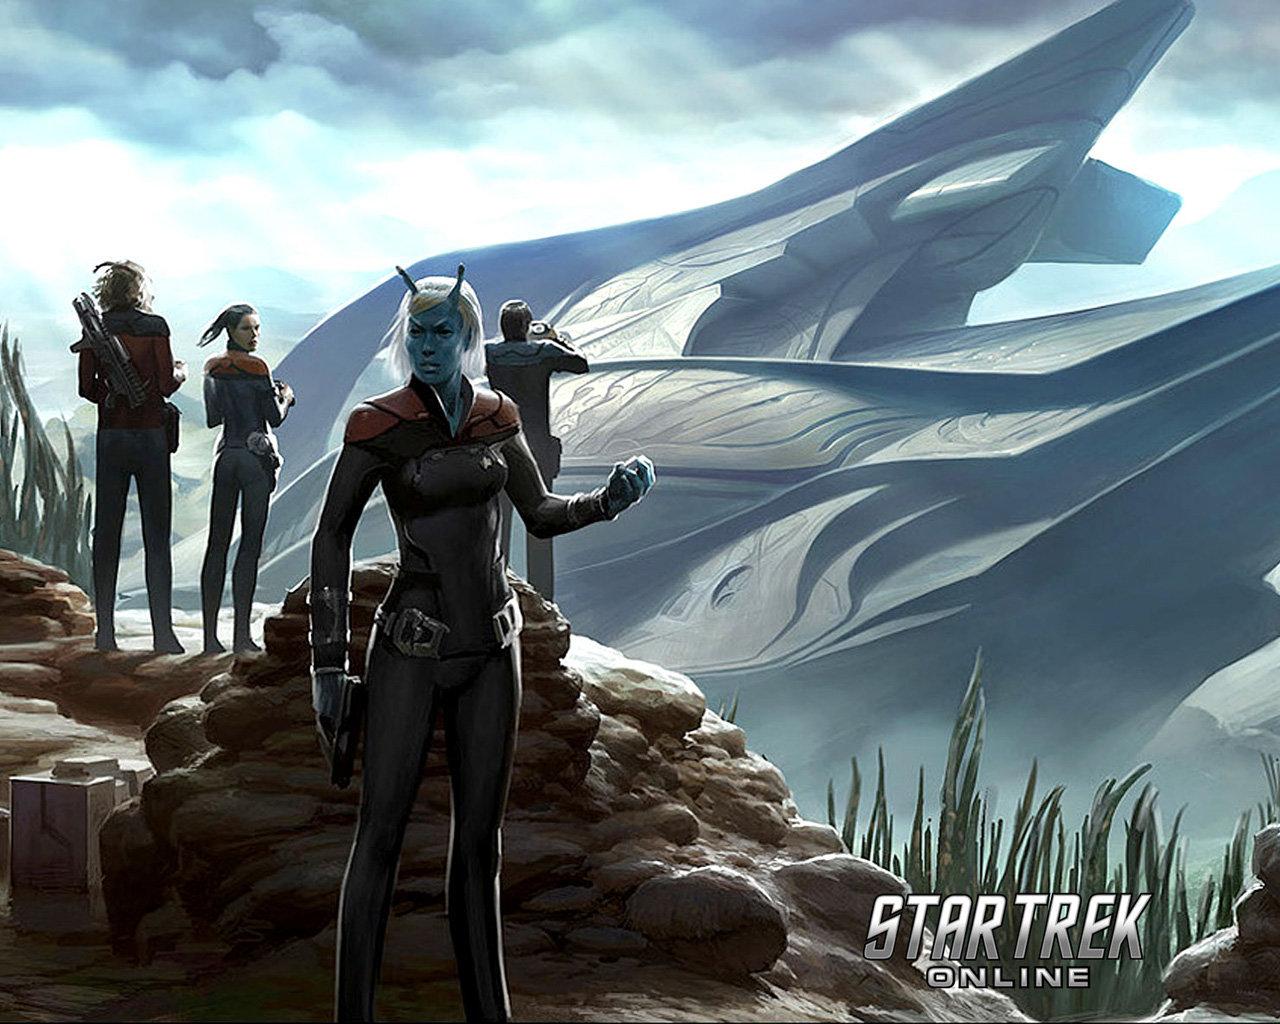 Best Star Trek Video Game Wallpaper ID276328 For High Resolution Hd 1280x1024 PC